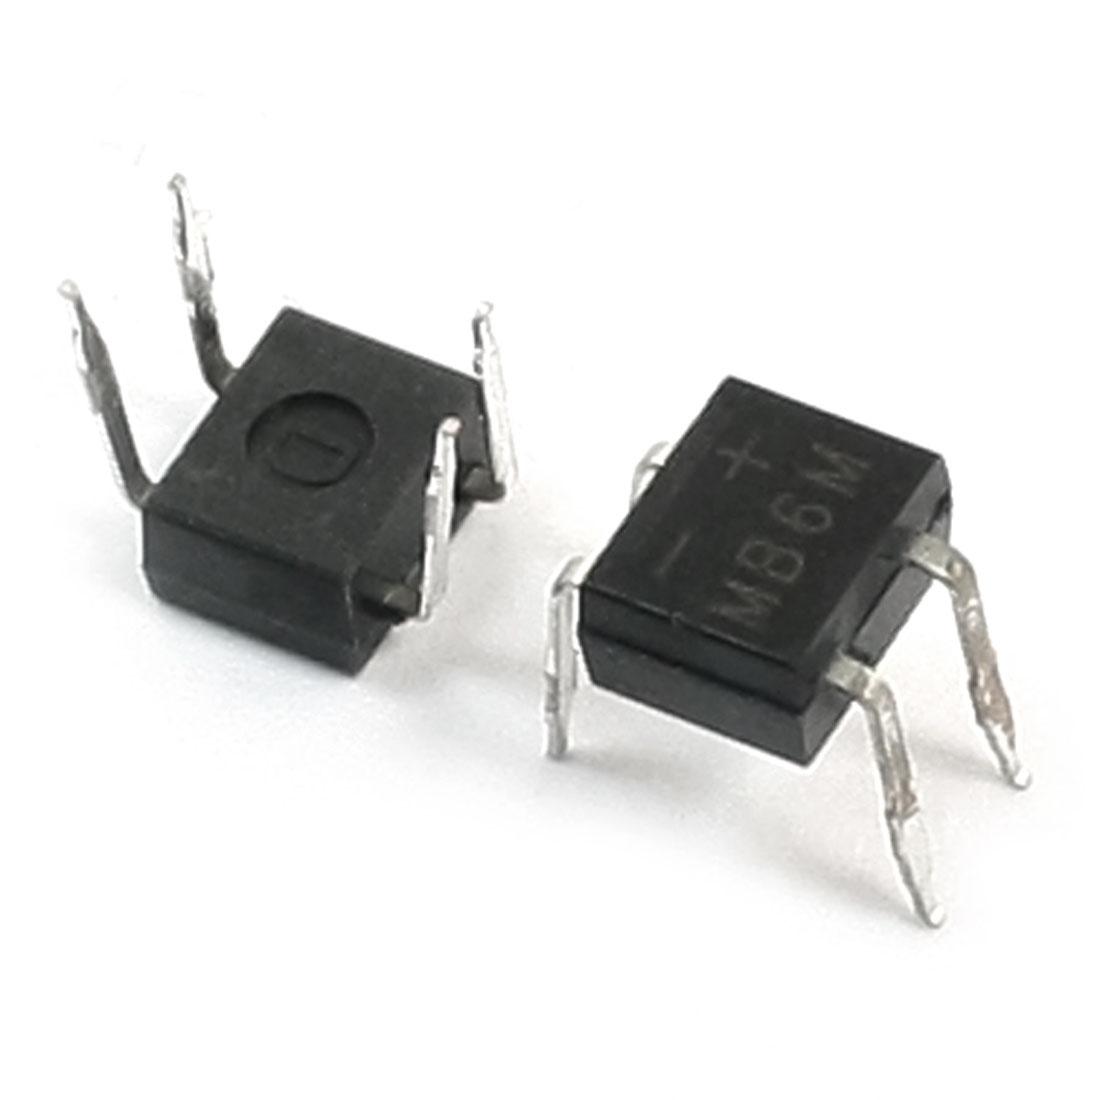 2PCS MB6M 0.5Amp 600V PCB Mounting 4Pins Terminals Rectifier Bridge